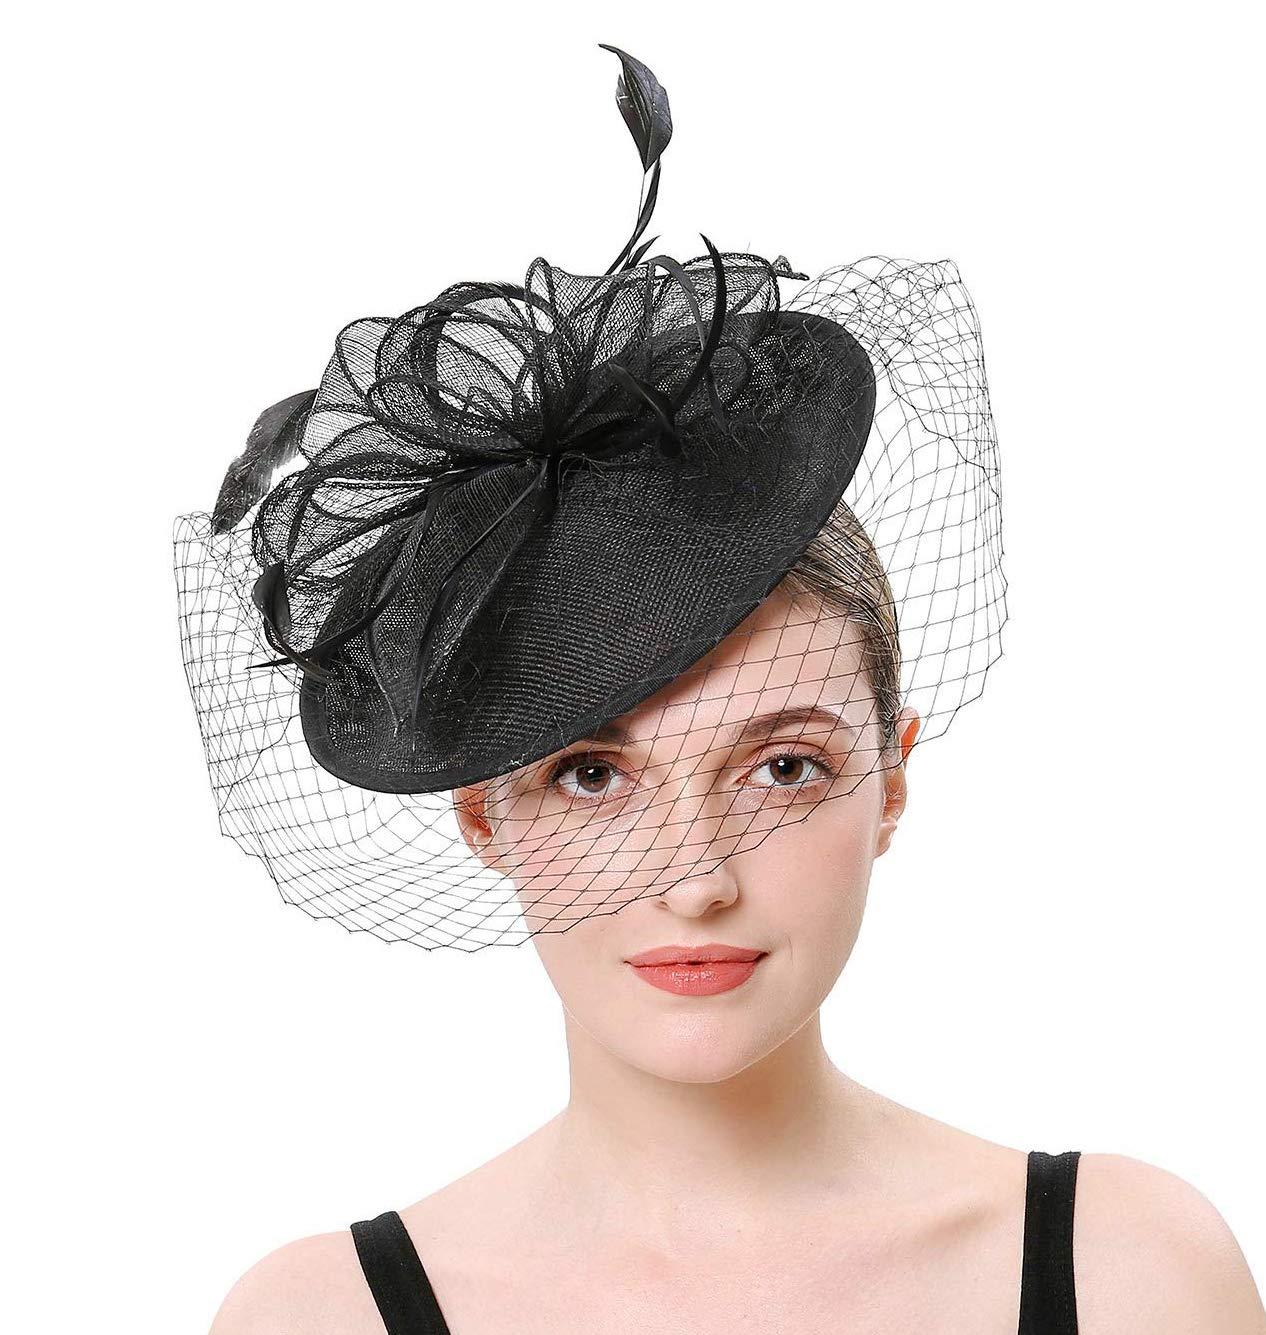 Hilary Ella Flax Net Face Veil Feather Fascinator for Women Cocktail Tea Party Derby Wedding Fascinators Hat by Hiary Ella